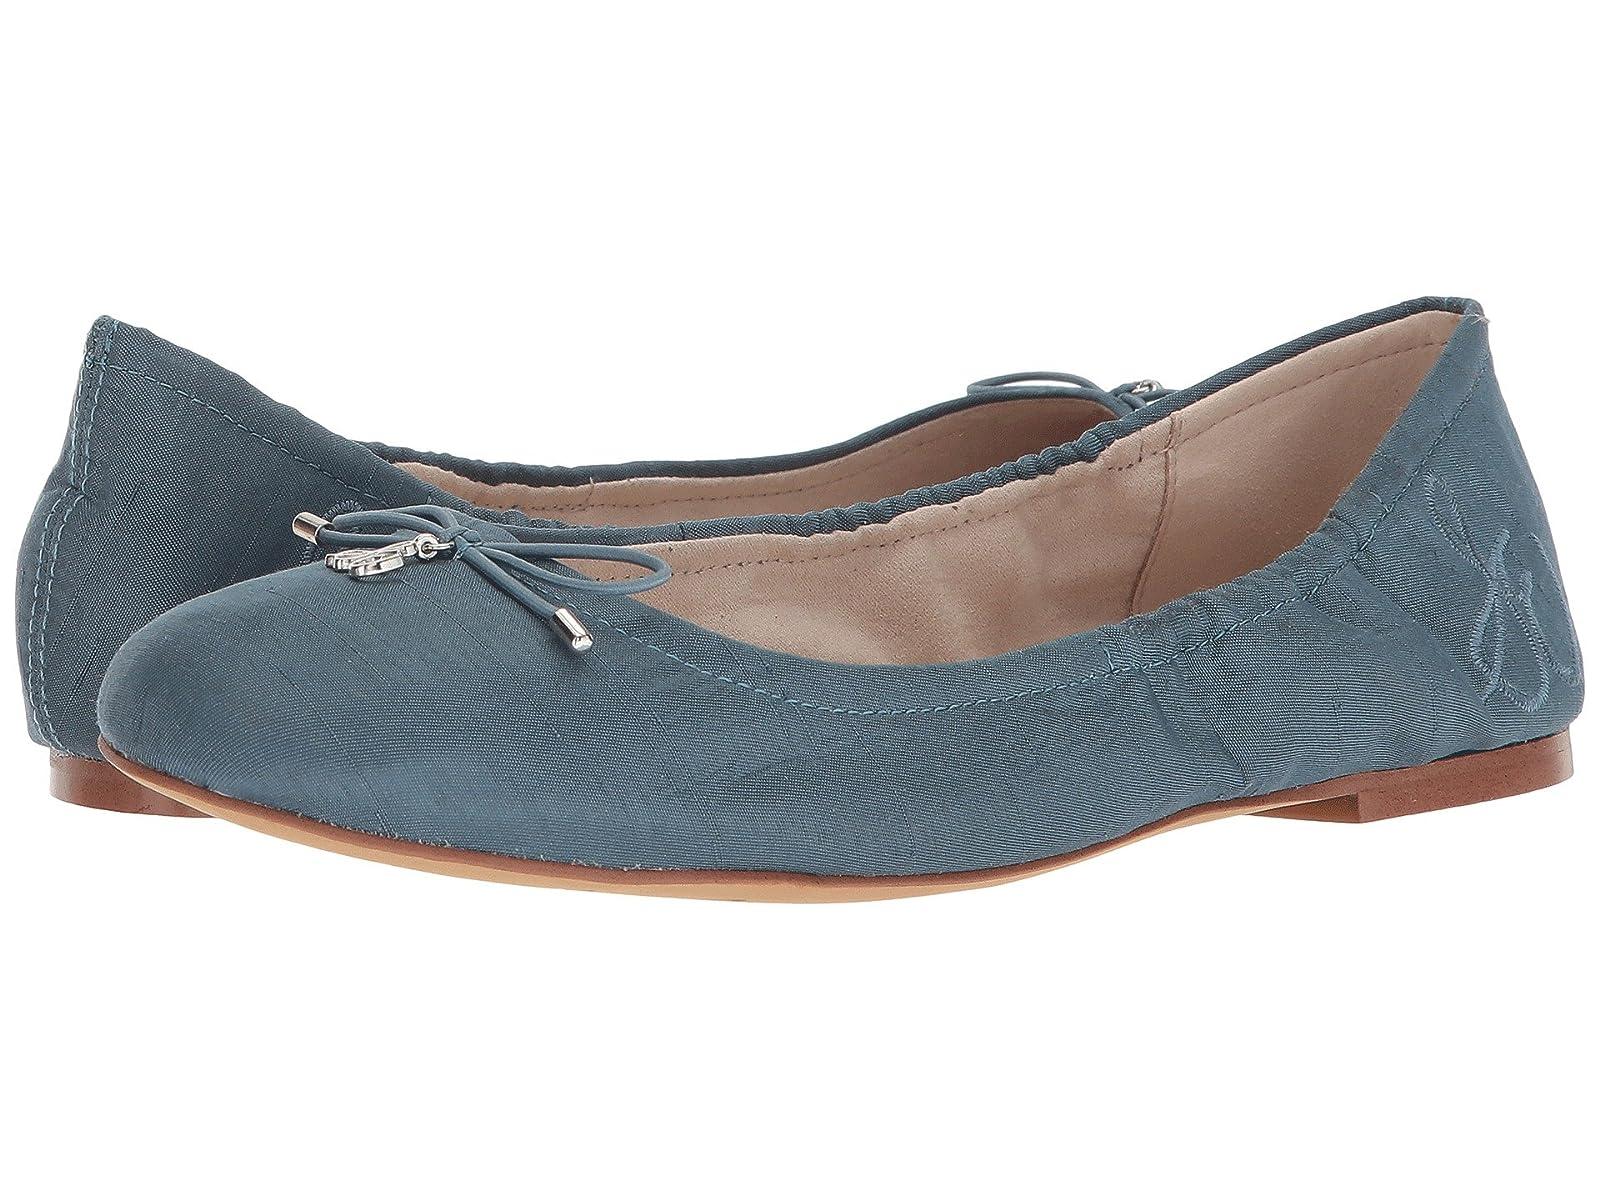 Sam Edelman FeliciaAtmospheric grades have affordable shoes